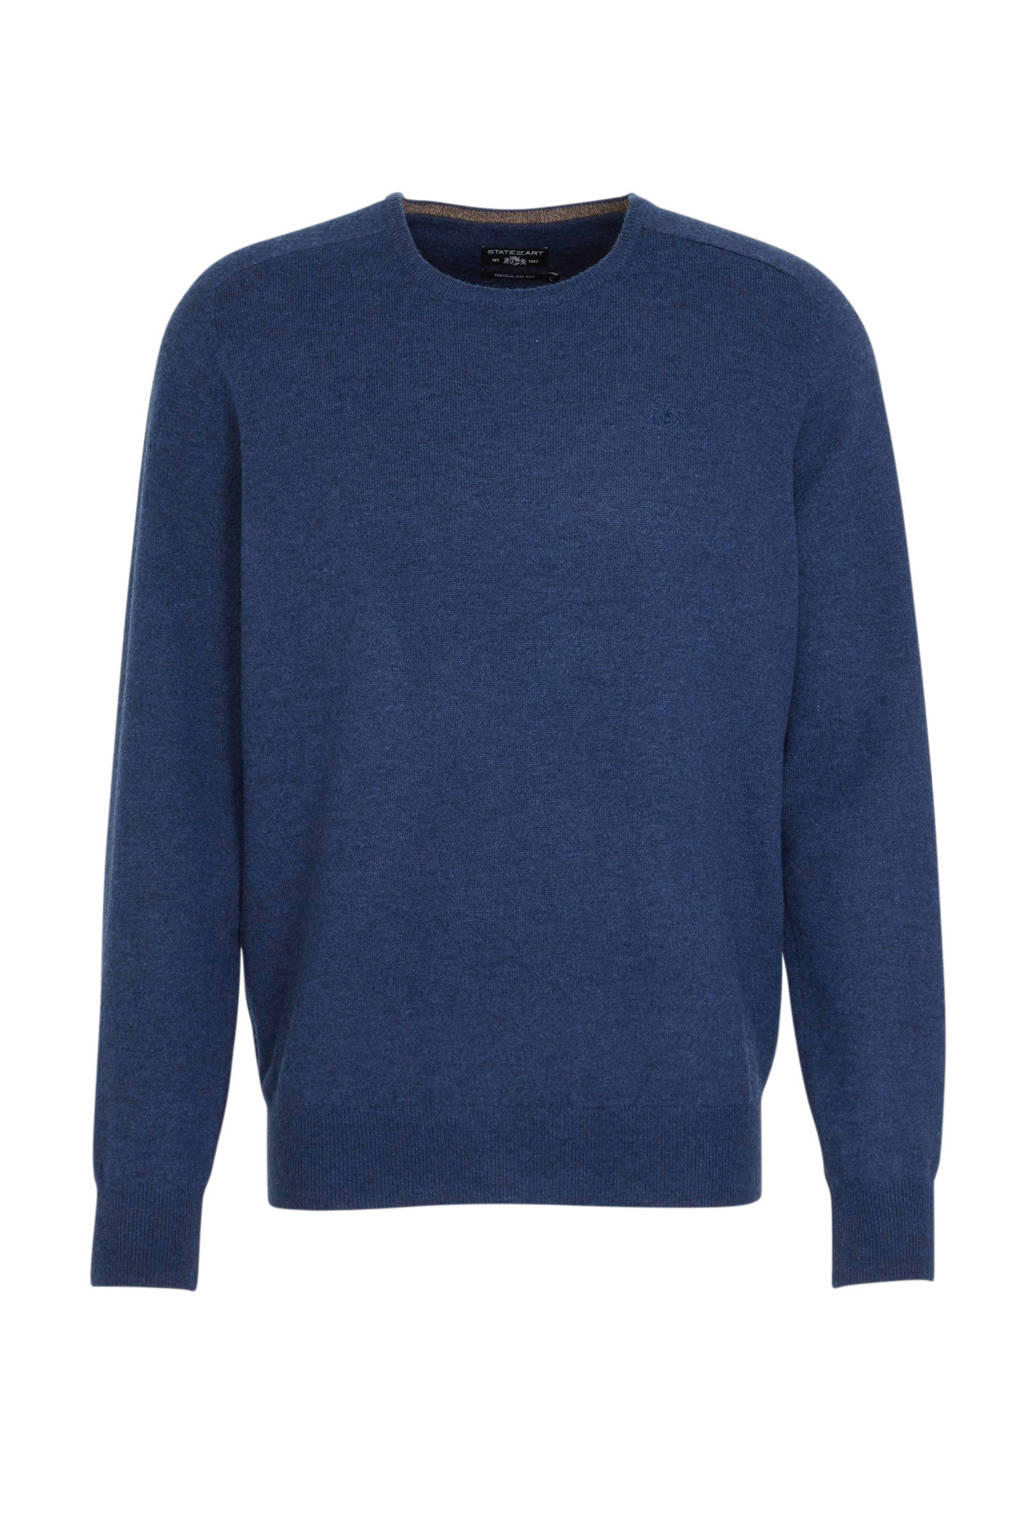 State of Art fijngebreide wollen trui kobaltblauw, Kobaltblauw